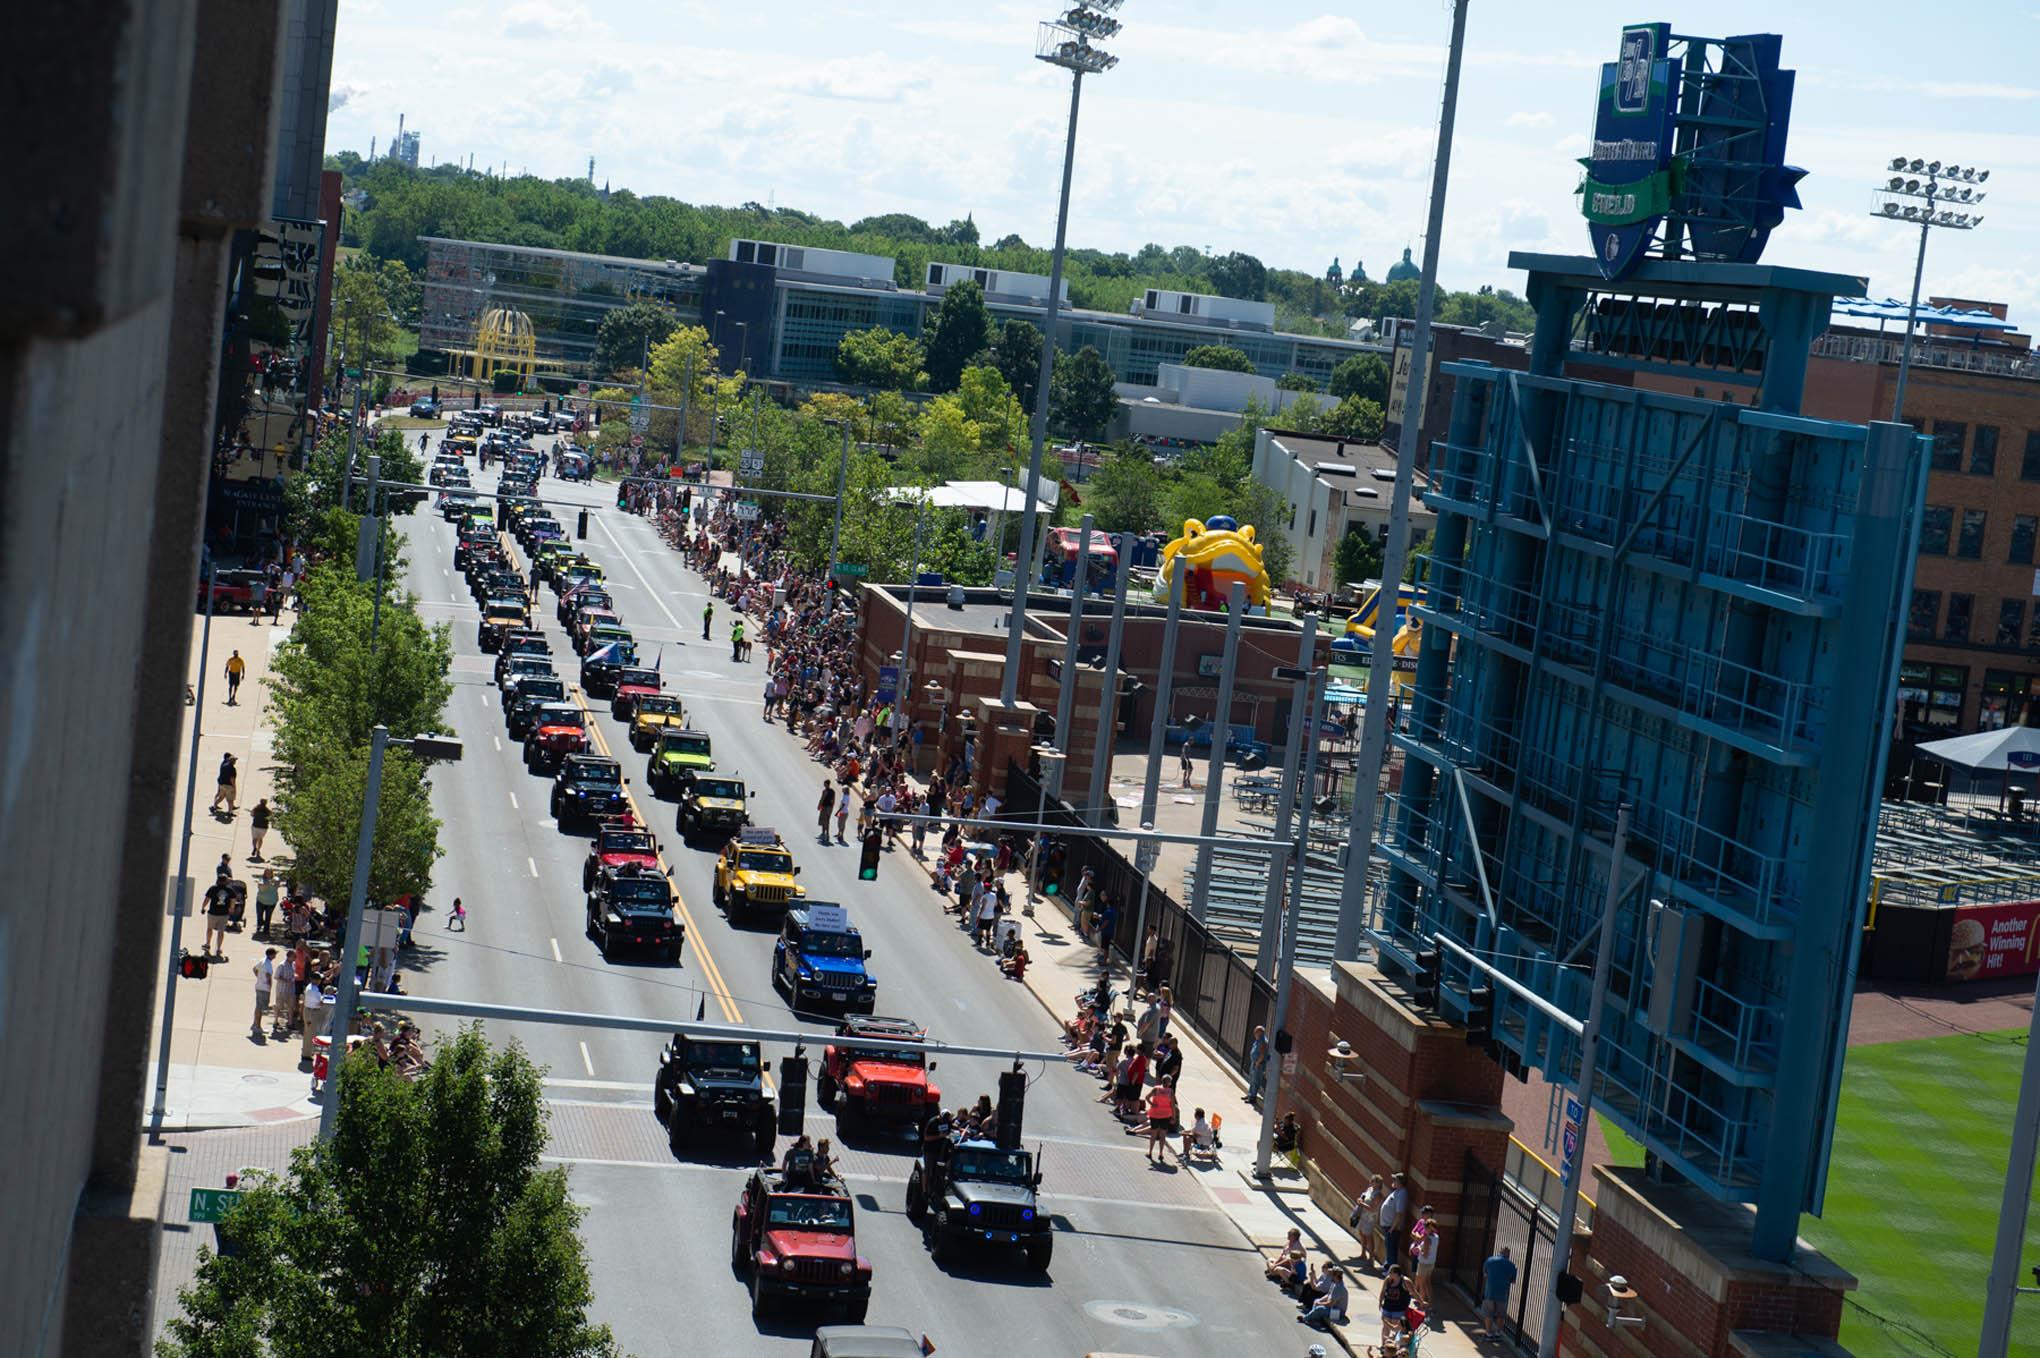 040 toledo jeep fest parade over